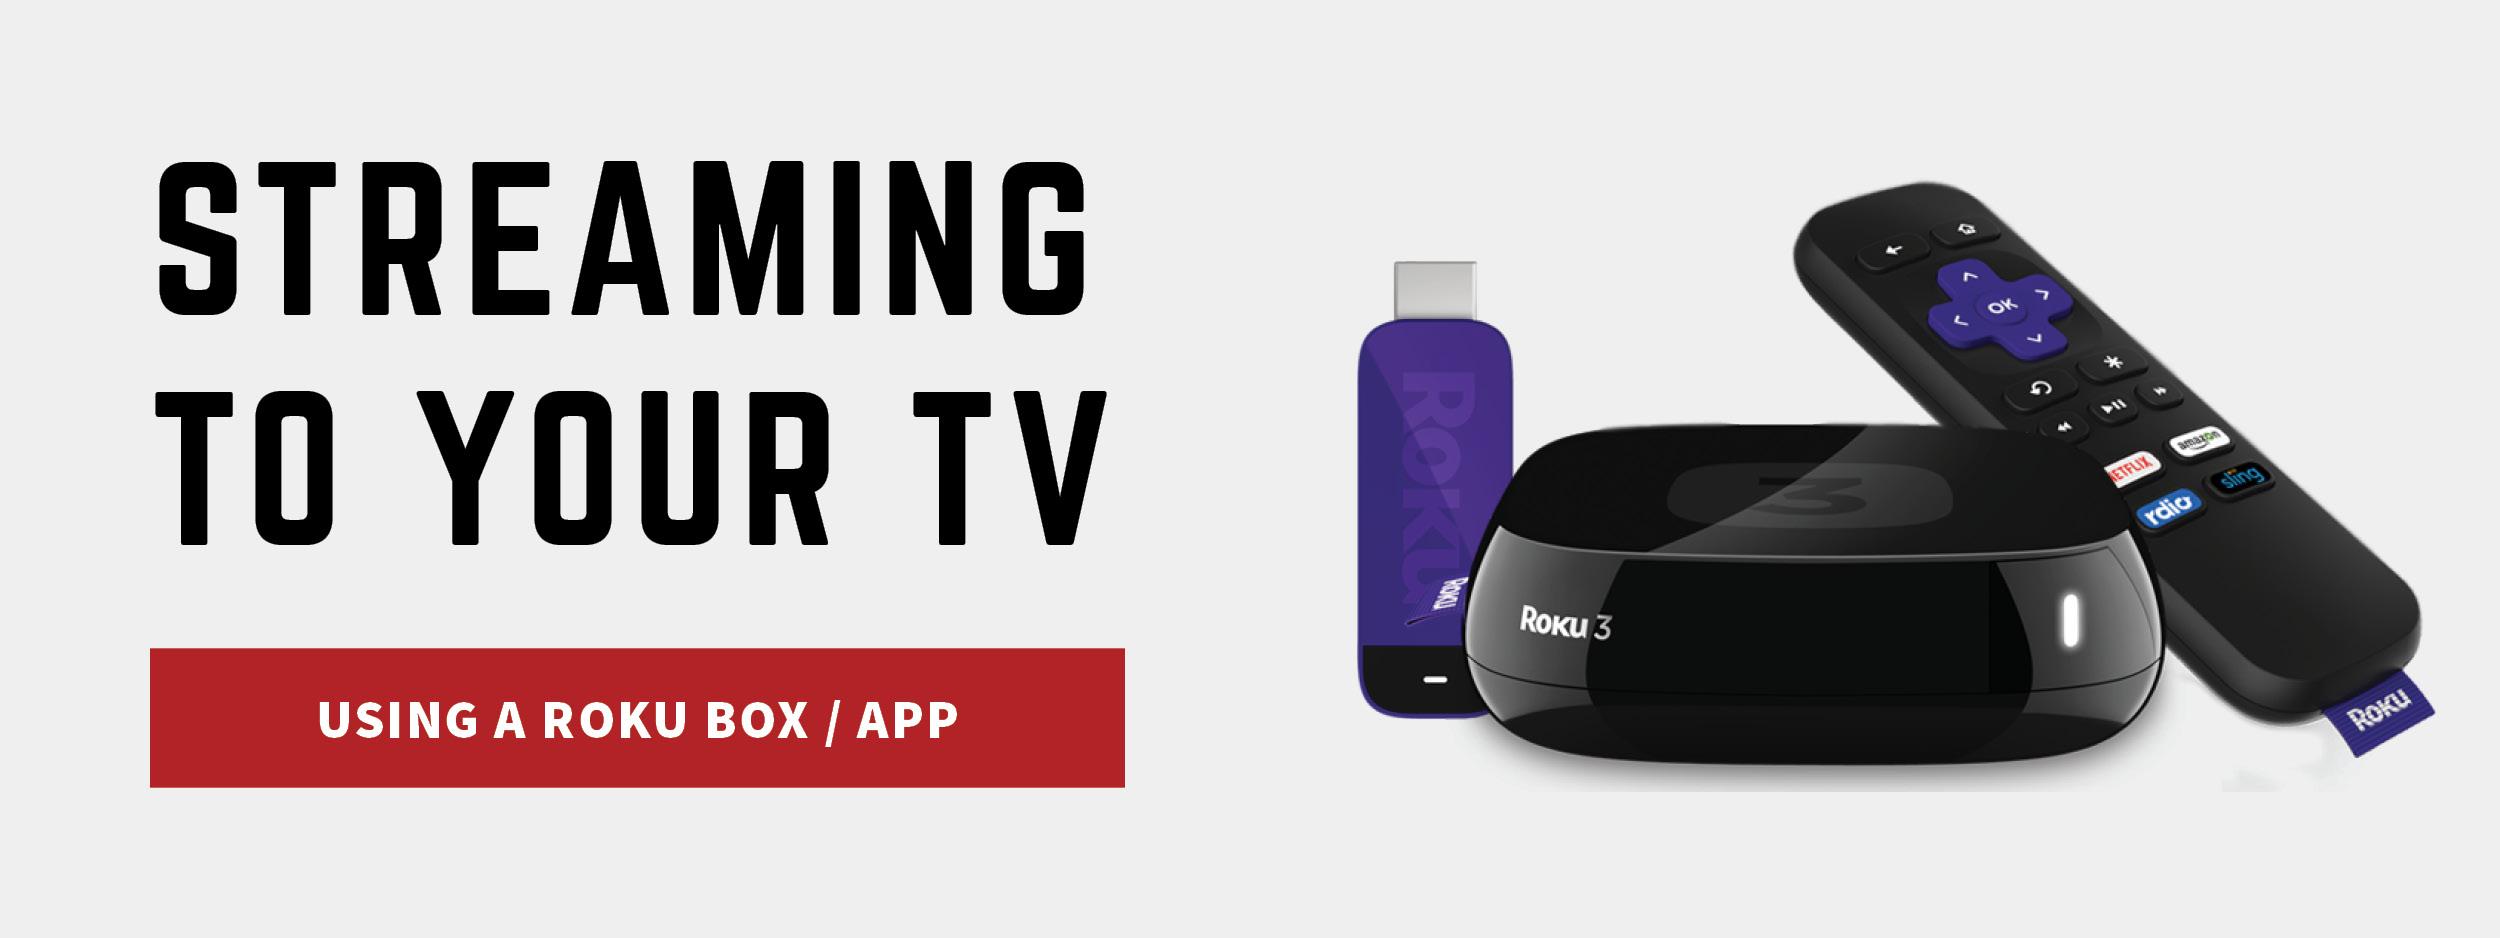 Stream using Roku